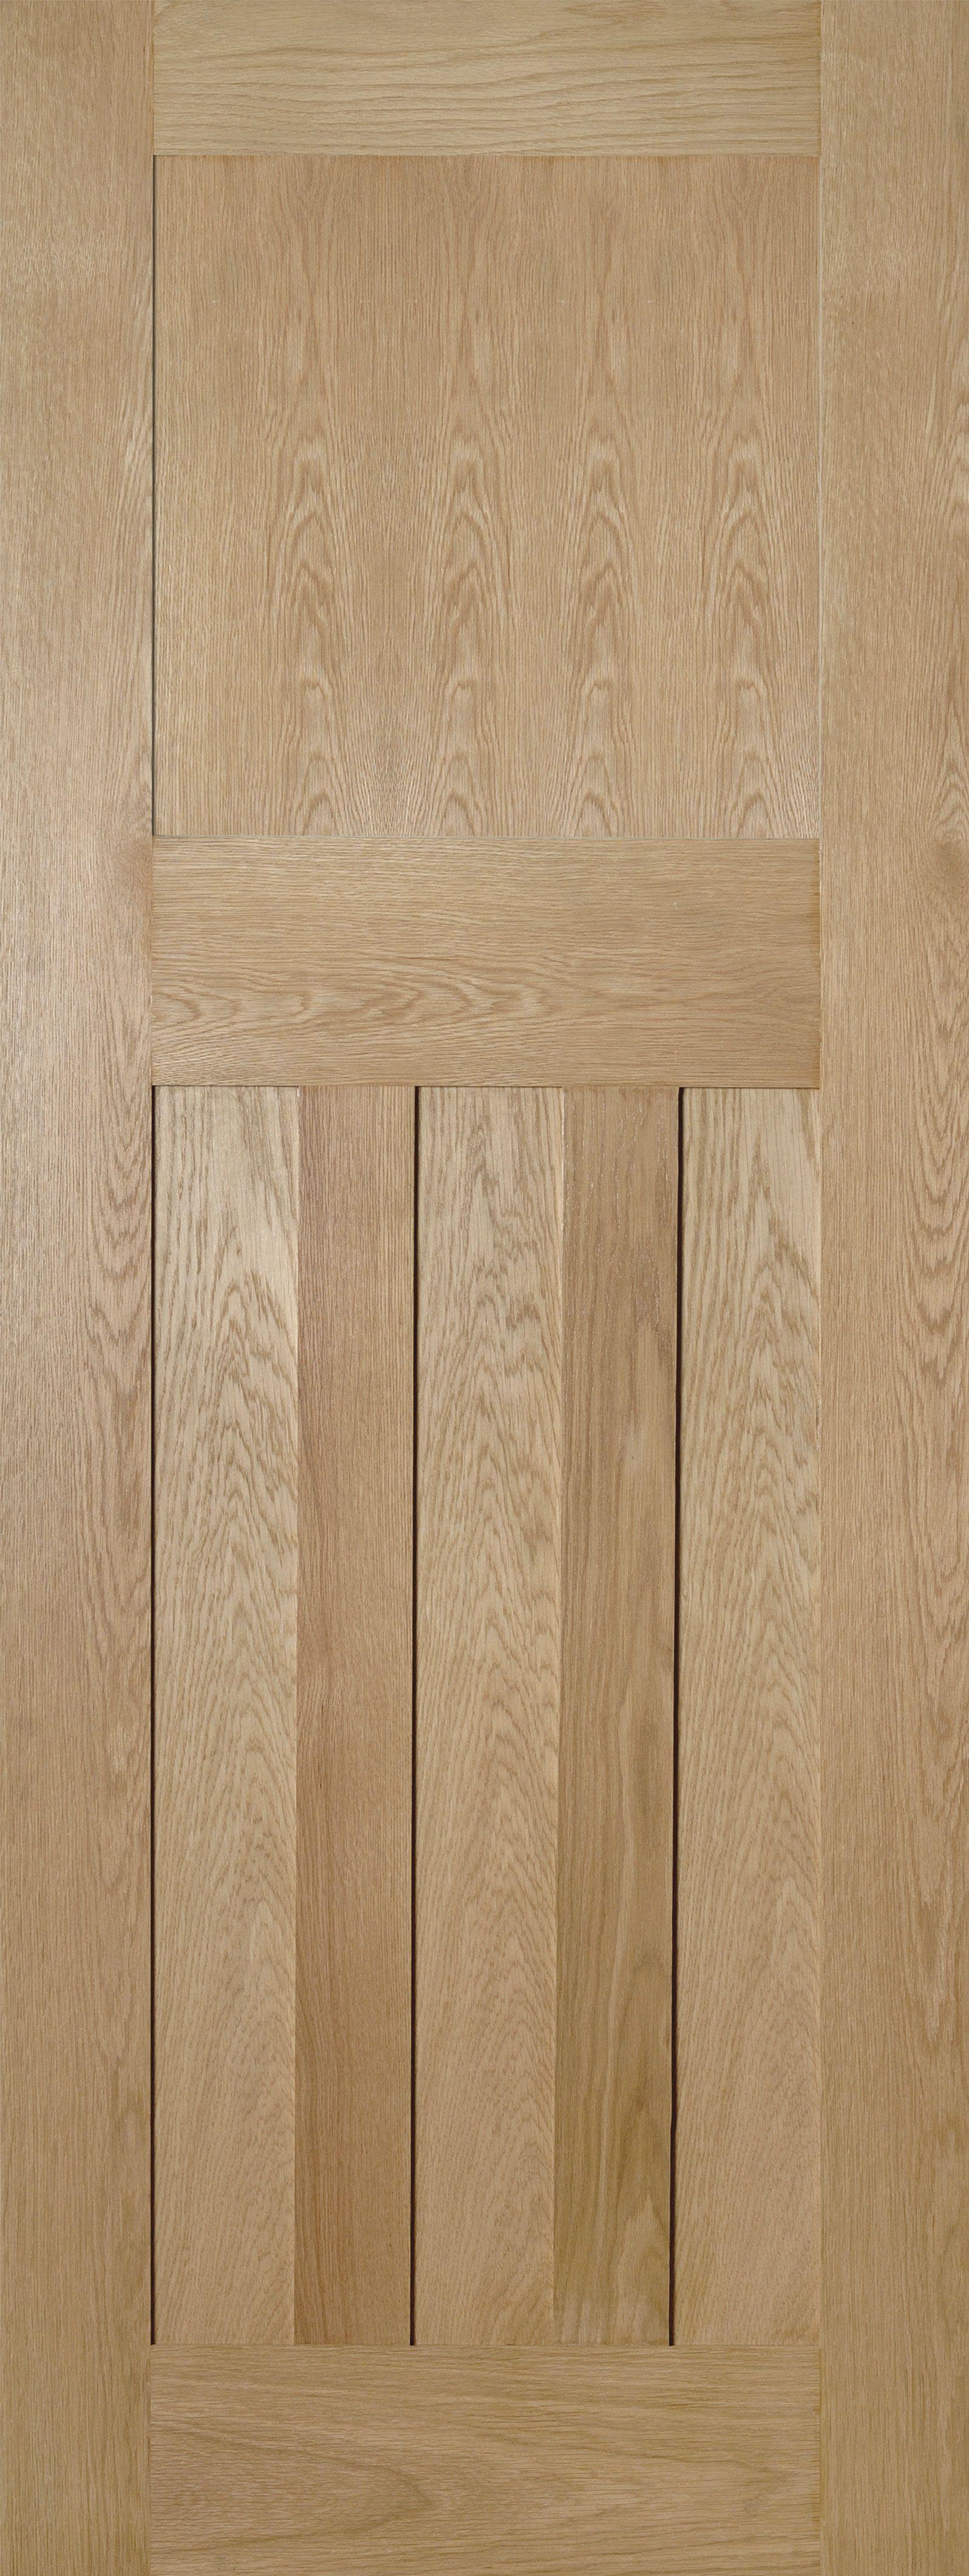 Oak Cambridge internal door affordable doors at